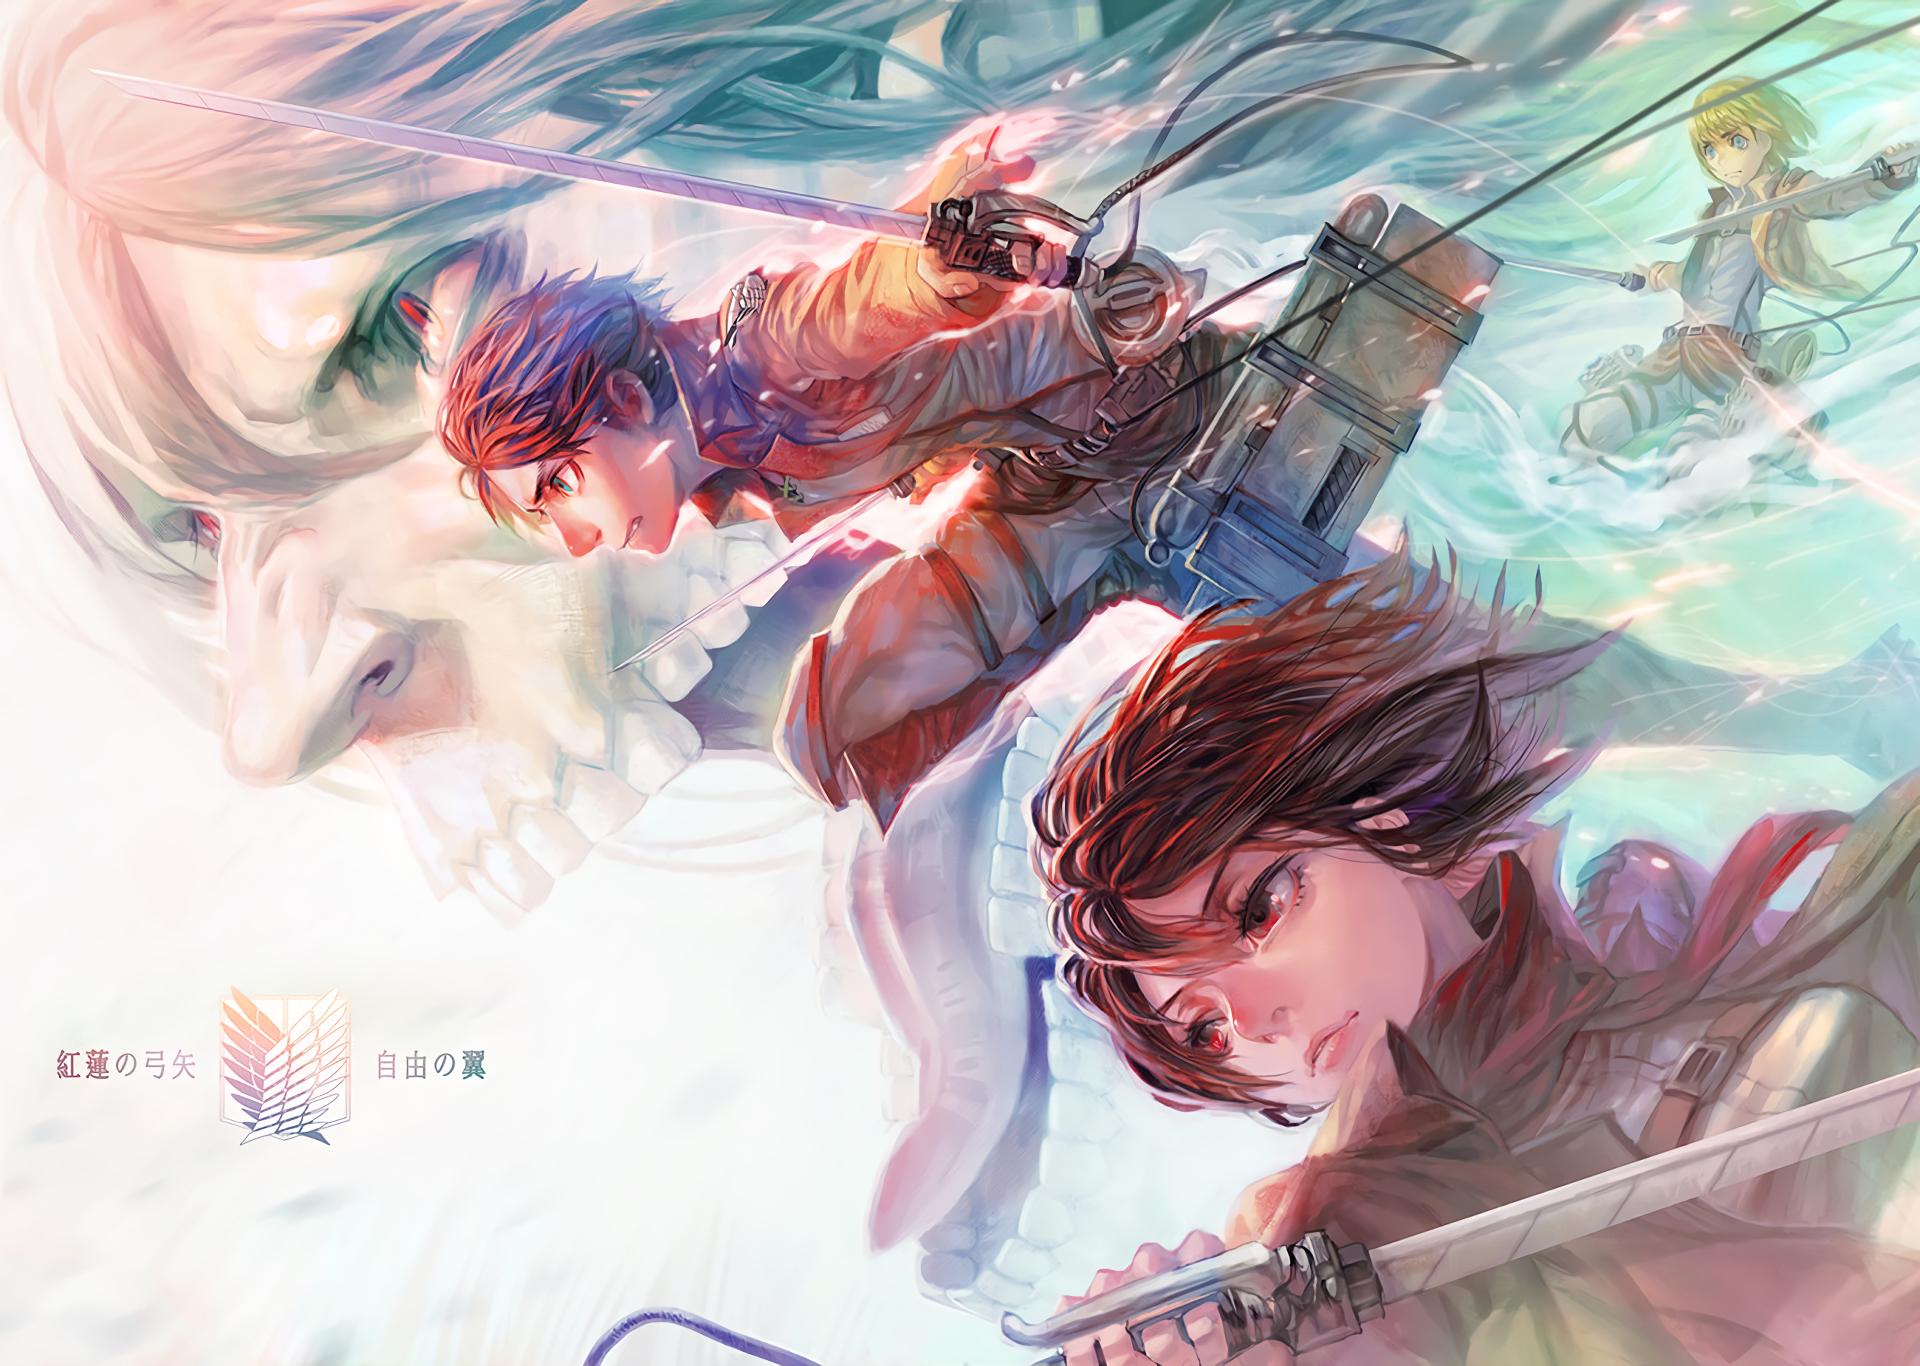 Mikasa Ackerman Eren Yeager And Armin Arlert Wallpaper Hd